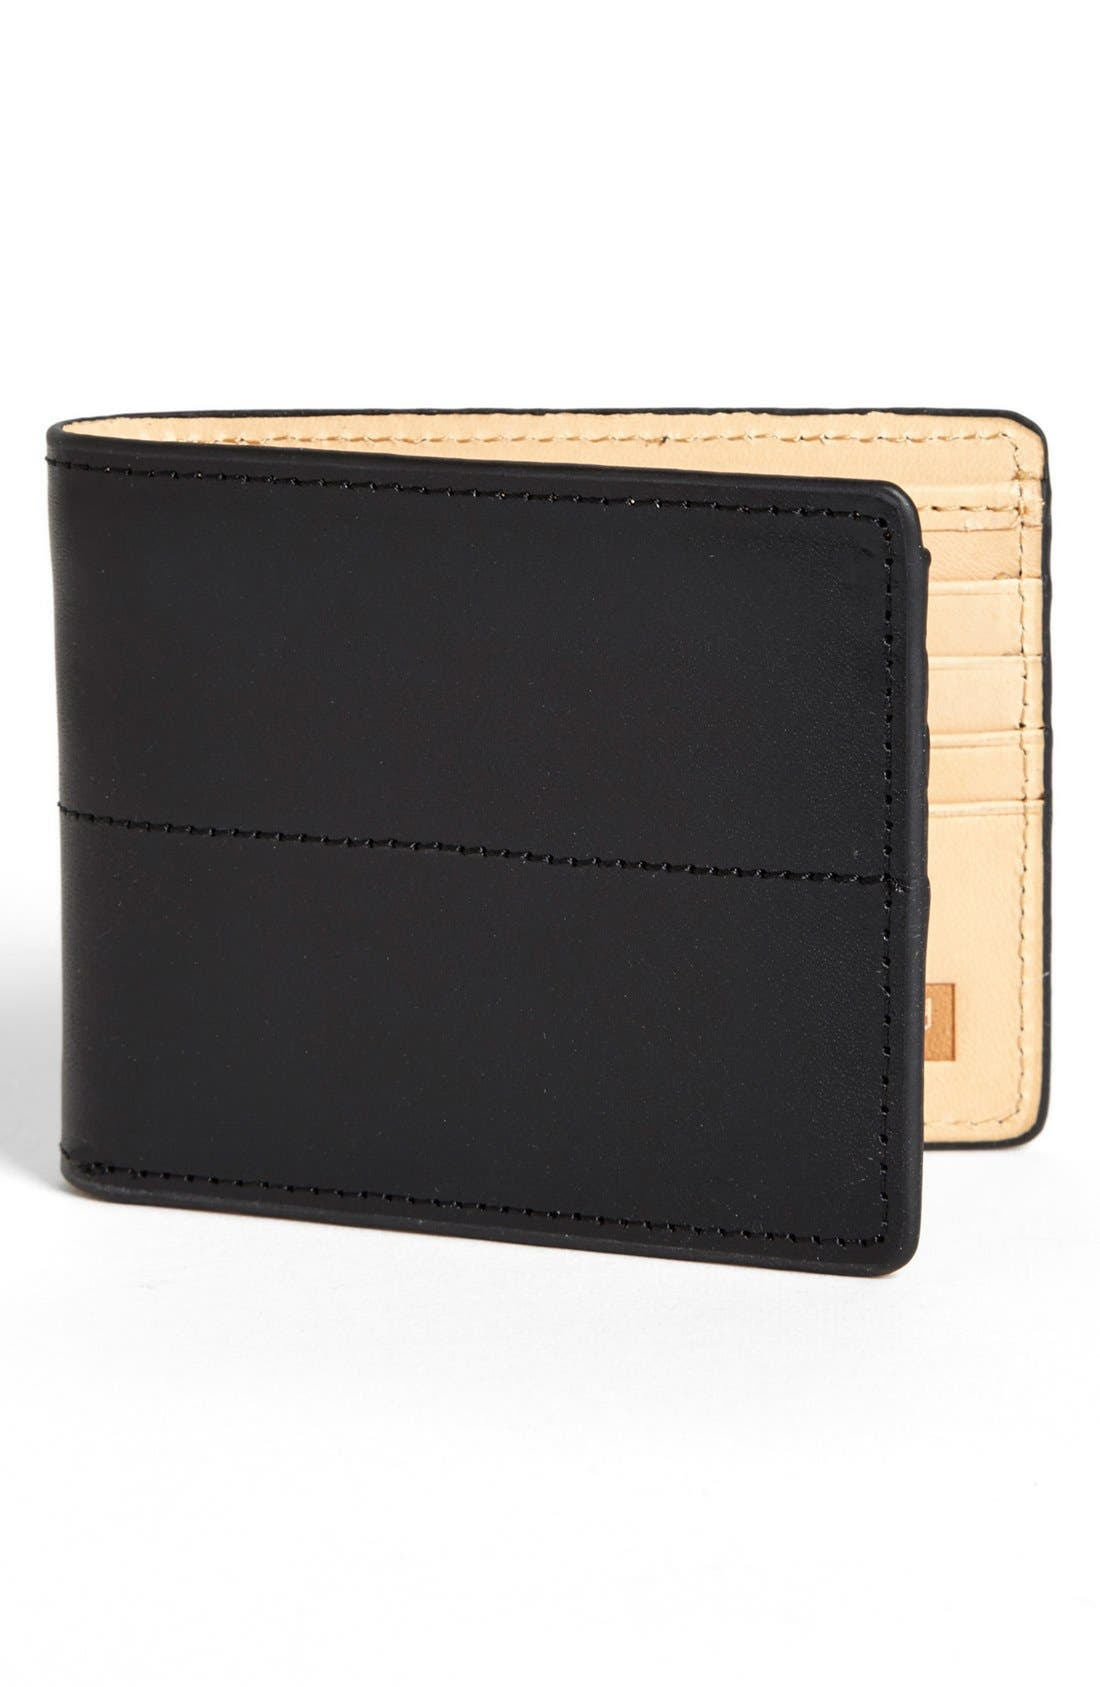 Main Image - J Fold 'Thunderbird' Slimfold Wallet